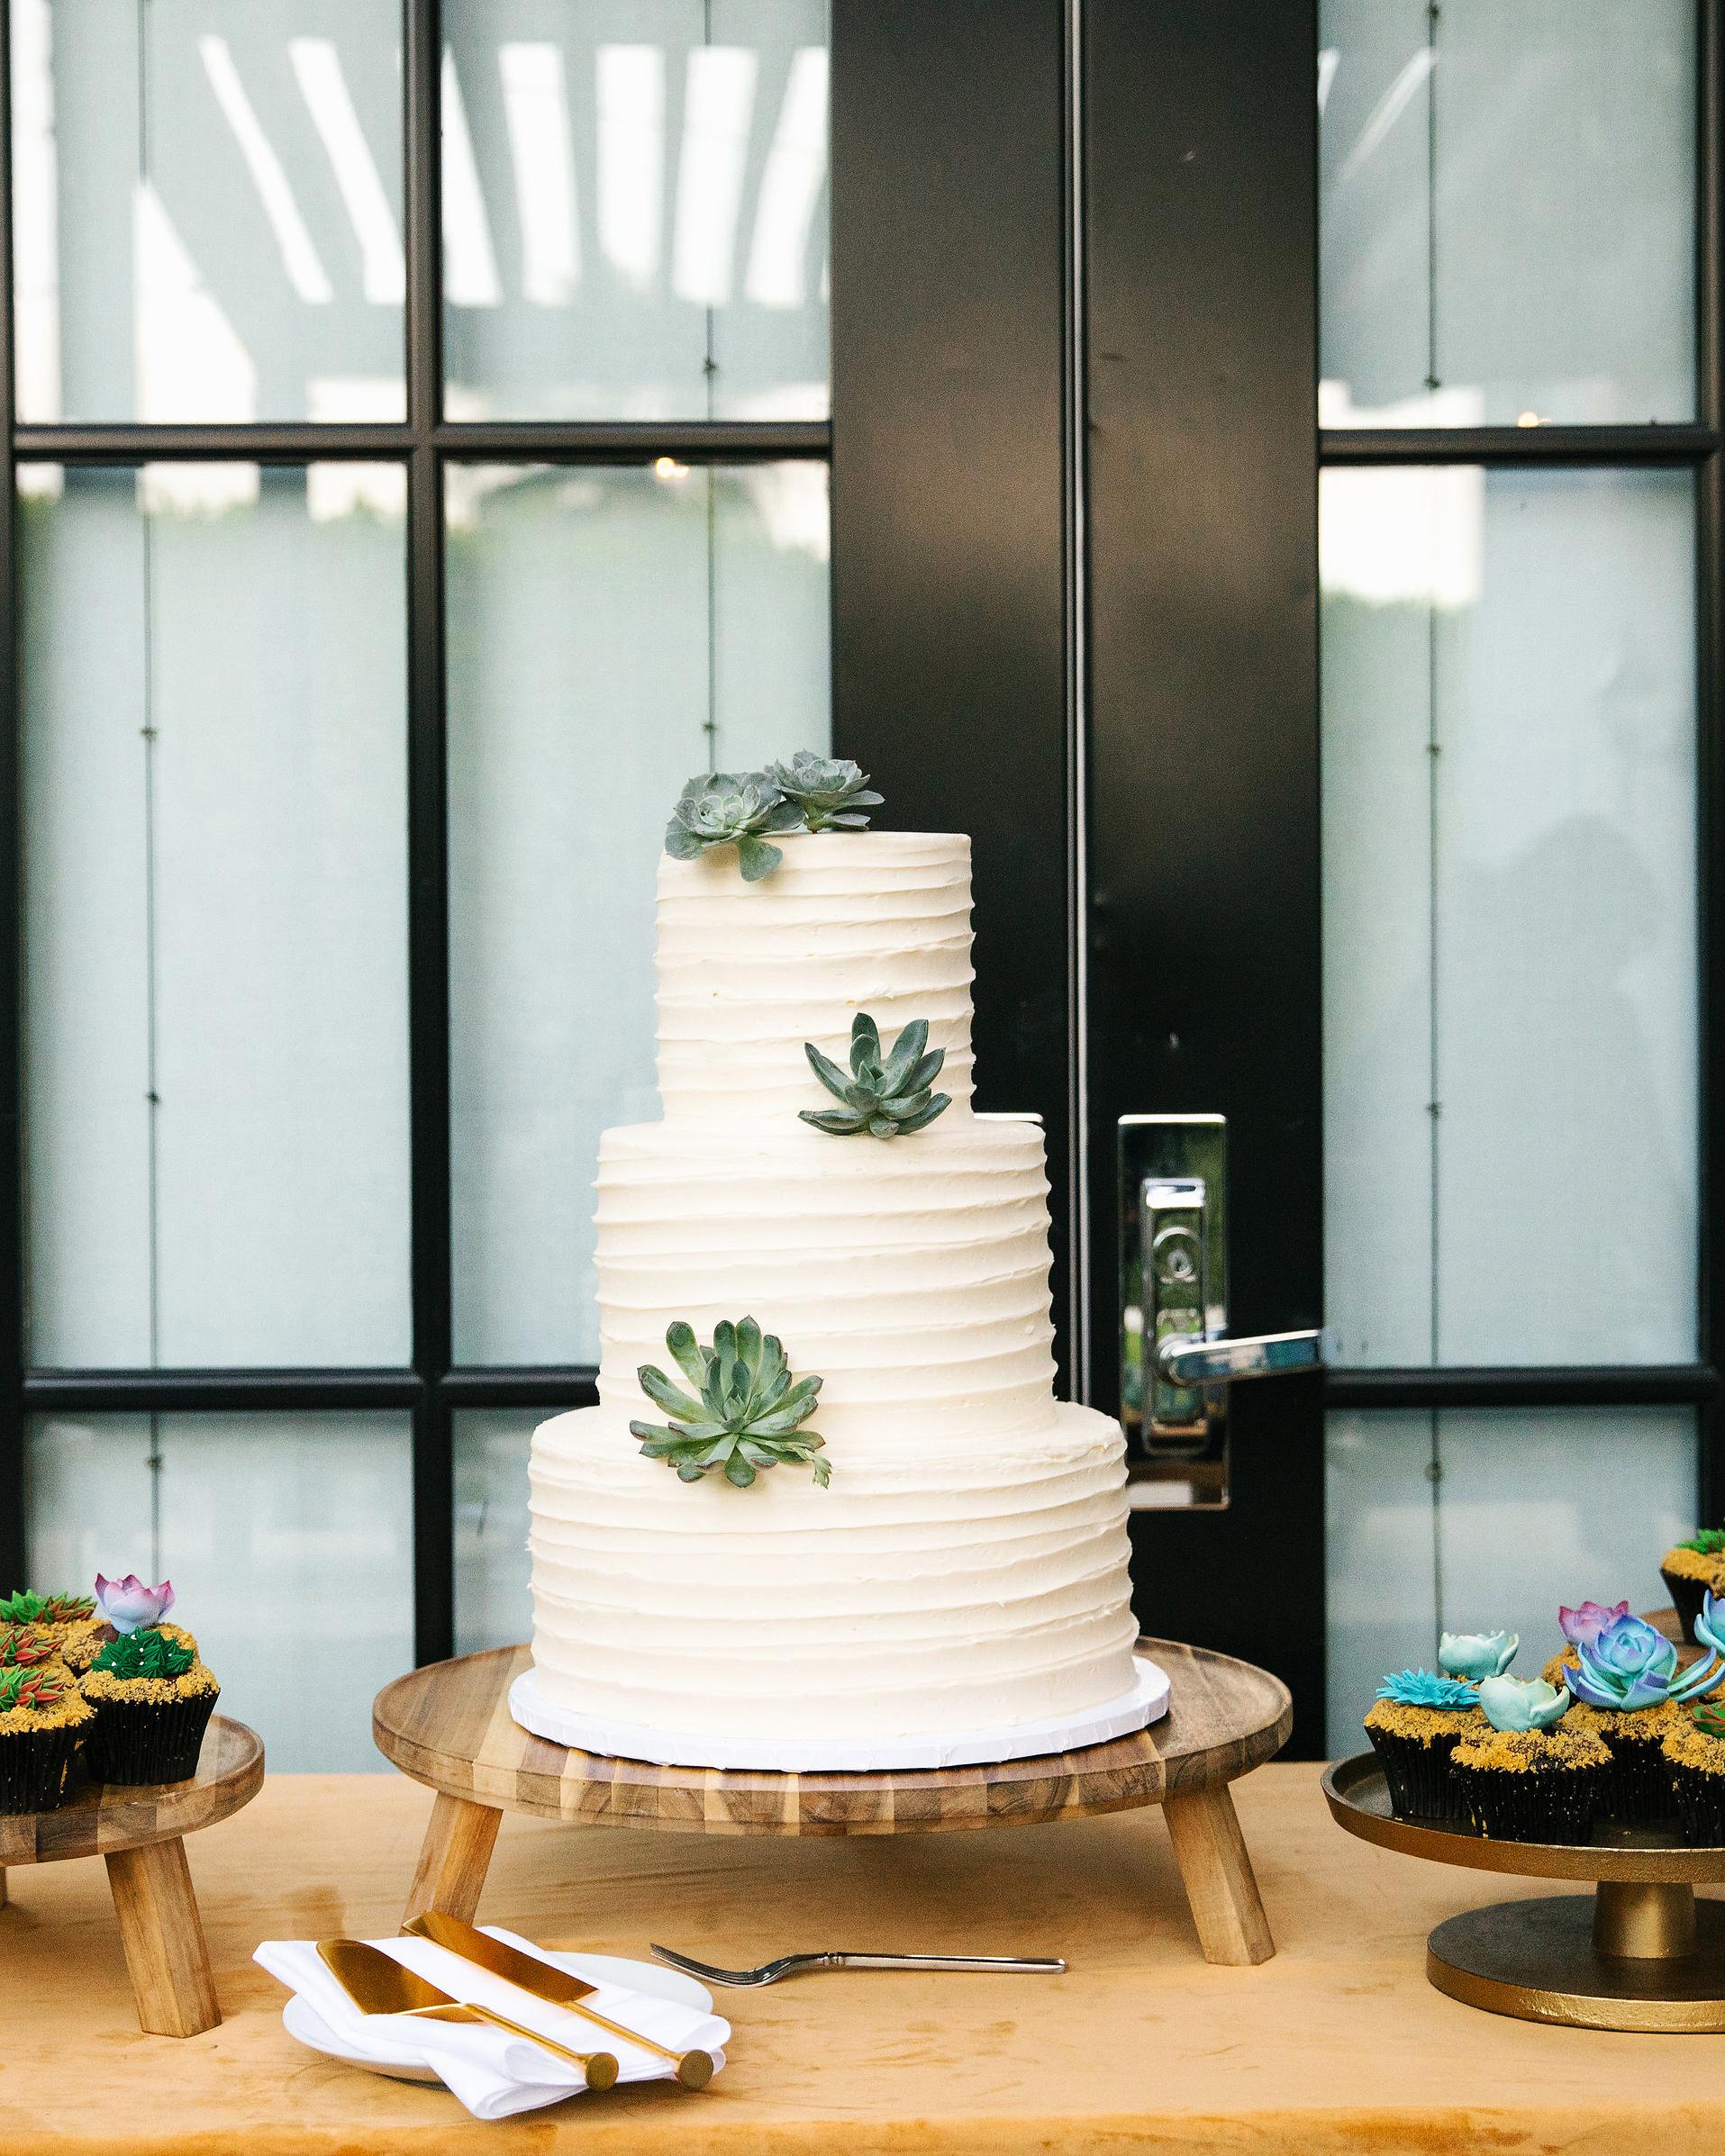 michael thomas wedding cake display